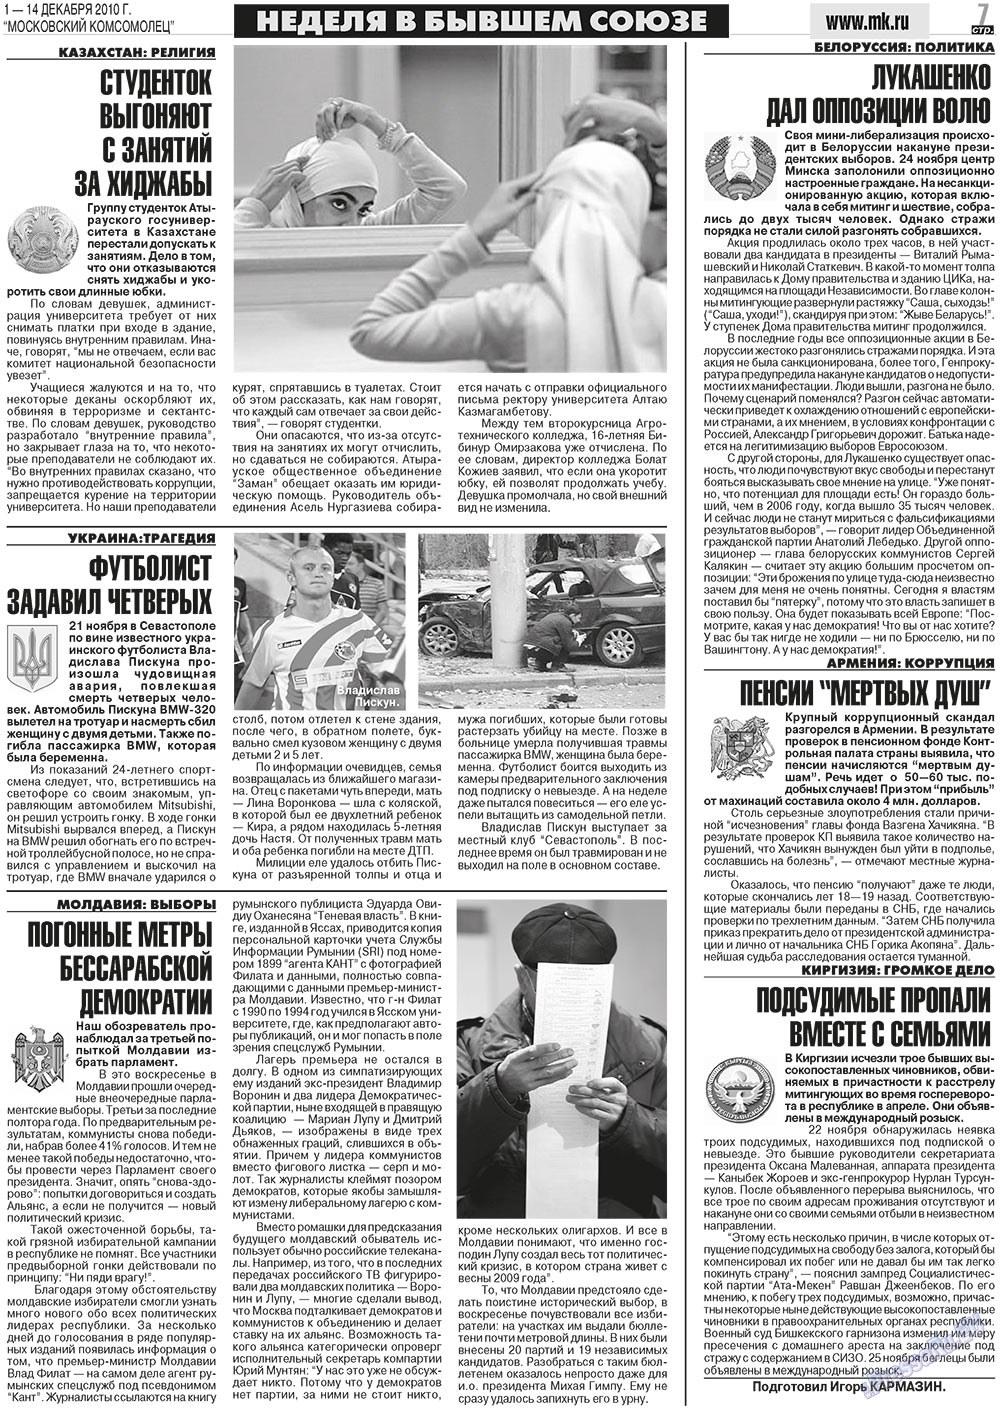 МК Испания (газета). 2010 год, номер 48, стр. 7